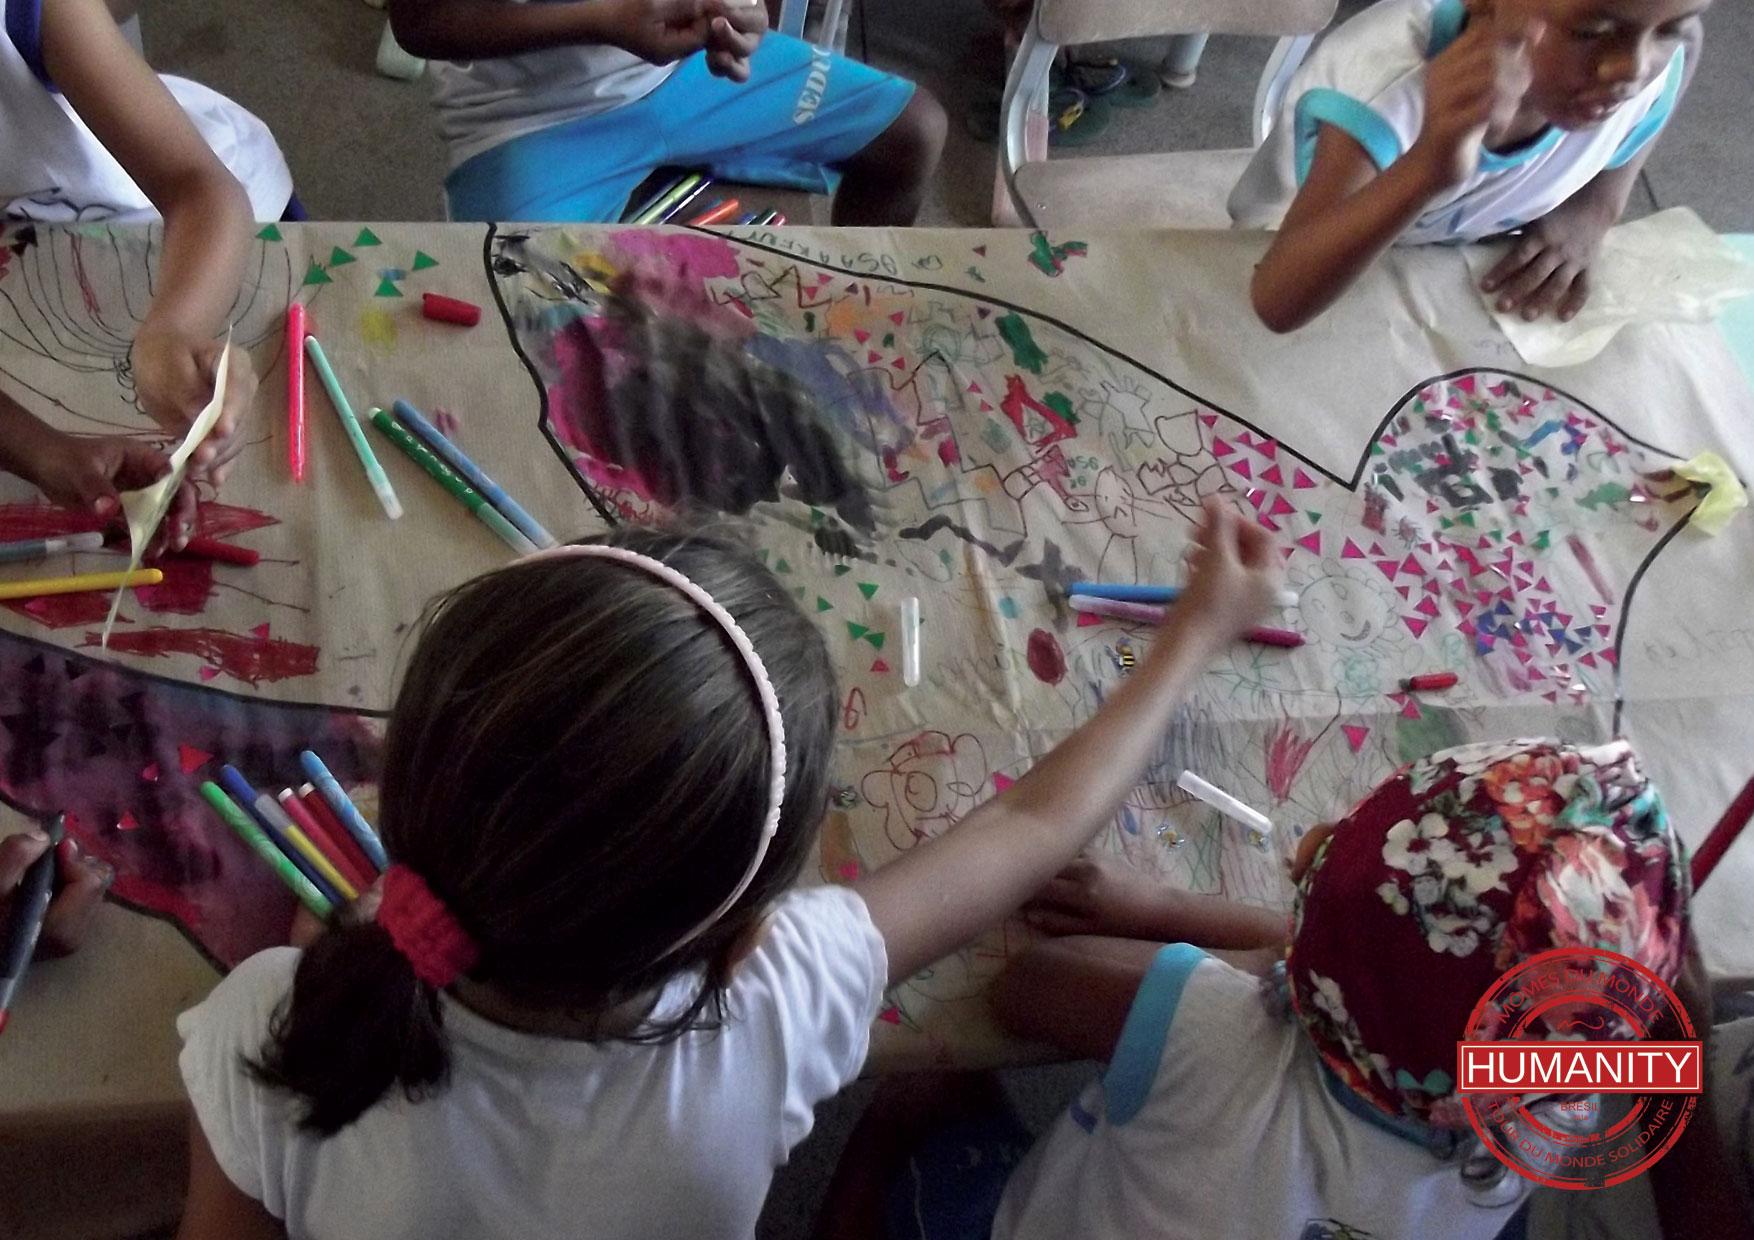 enfants crayons peinture